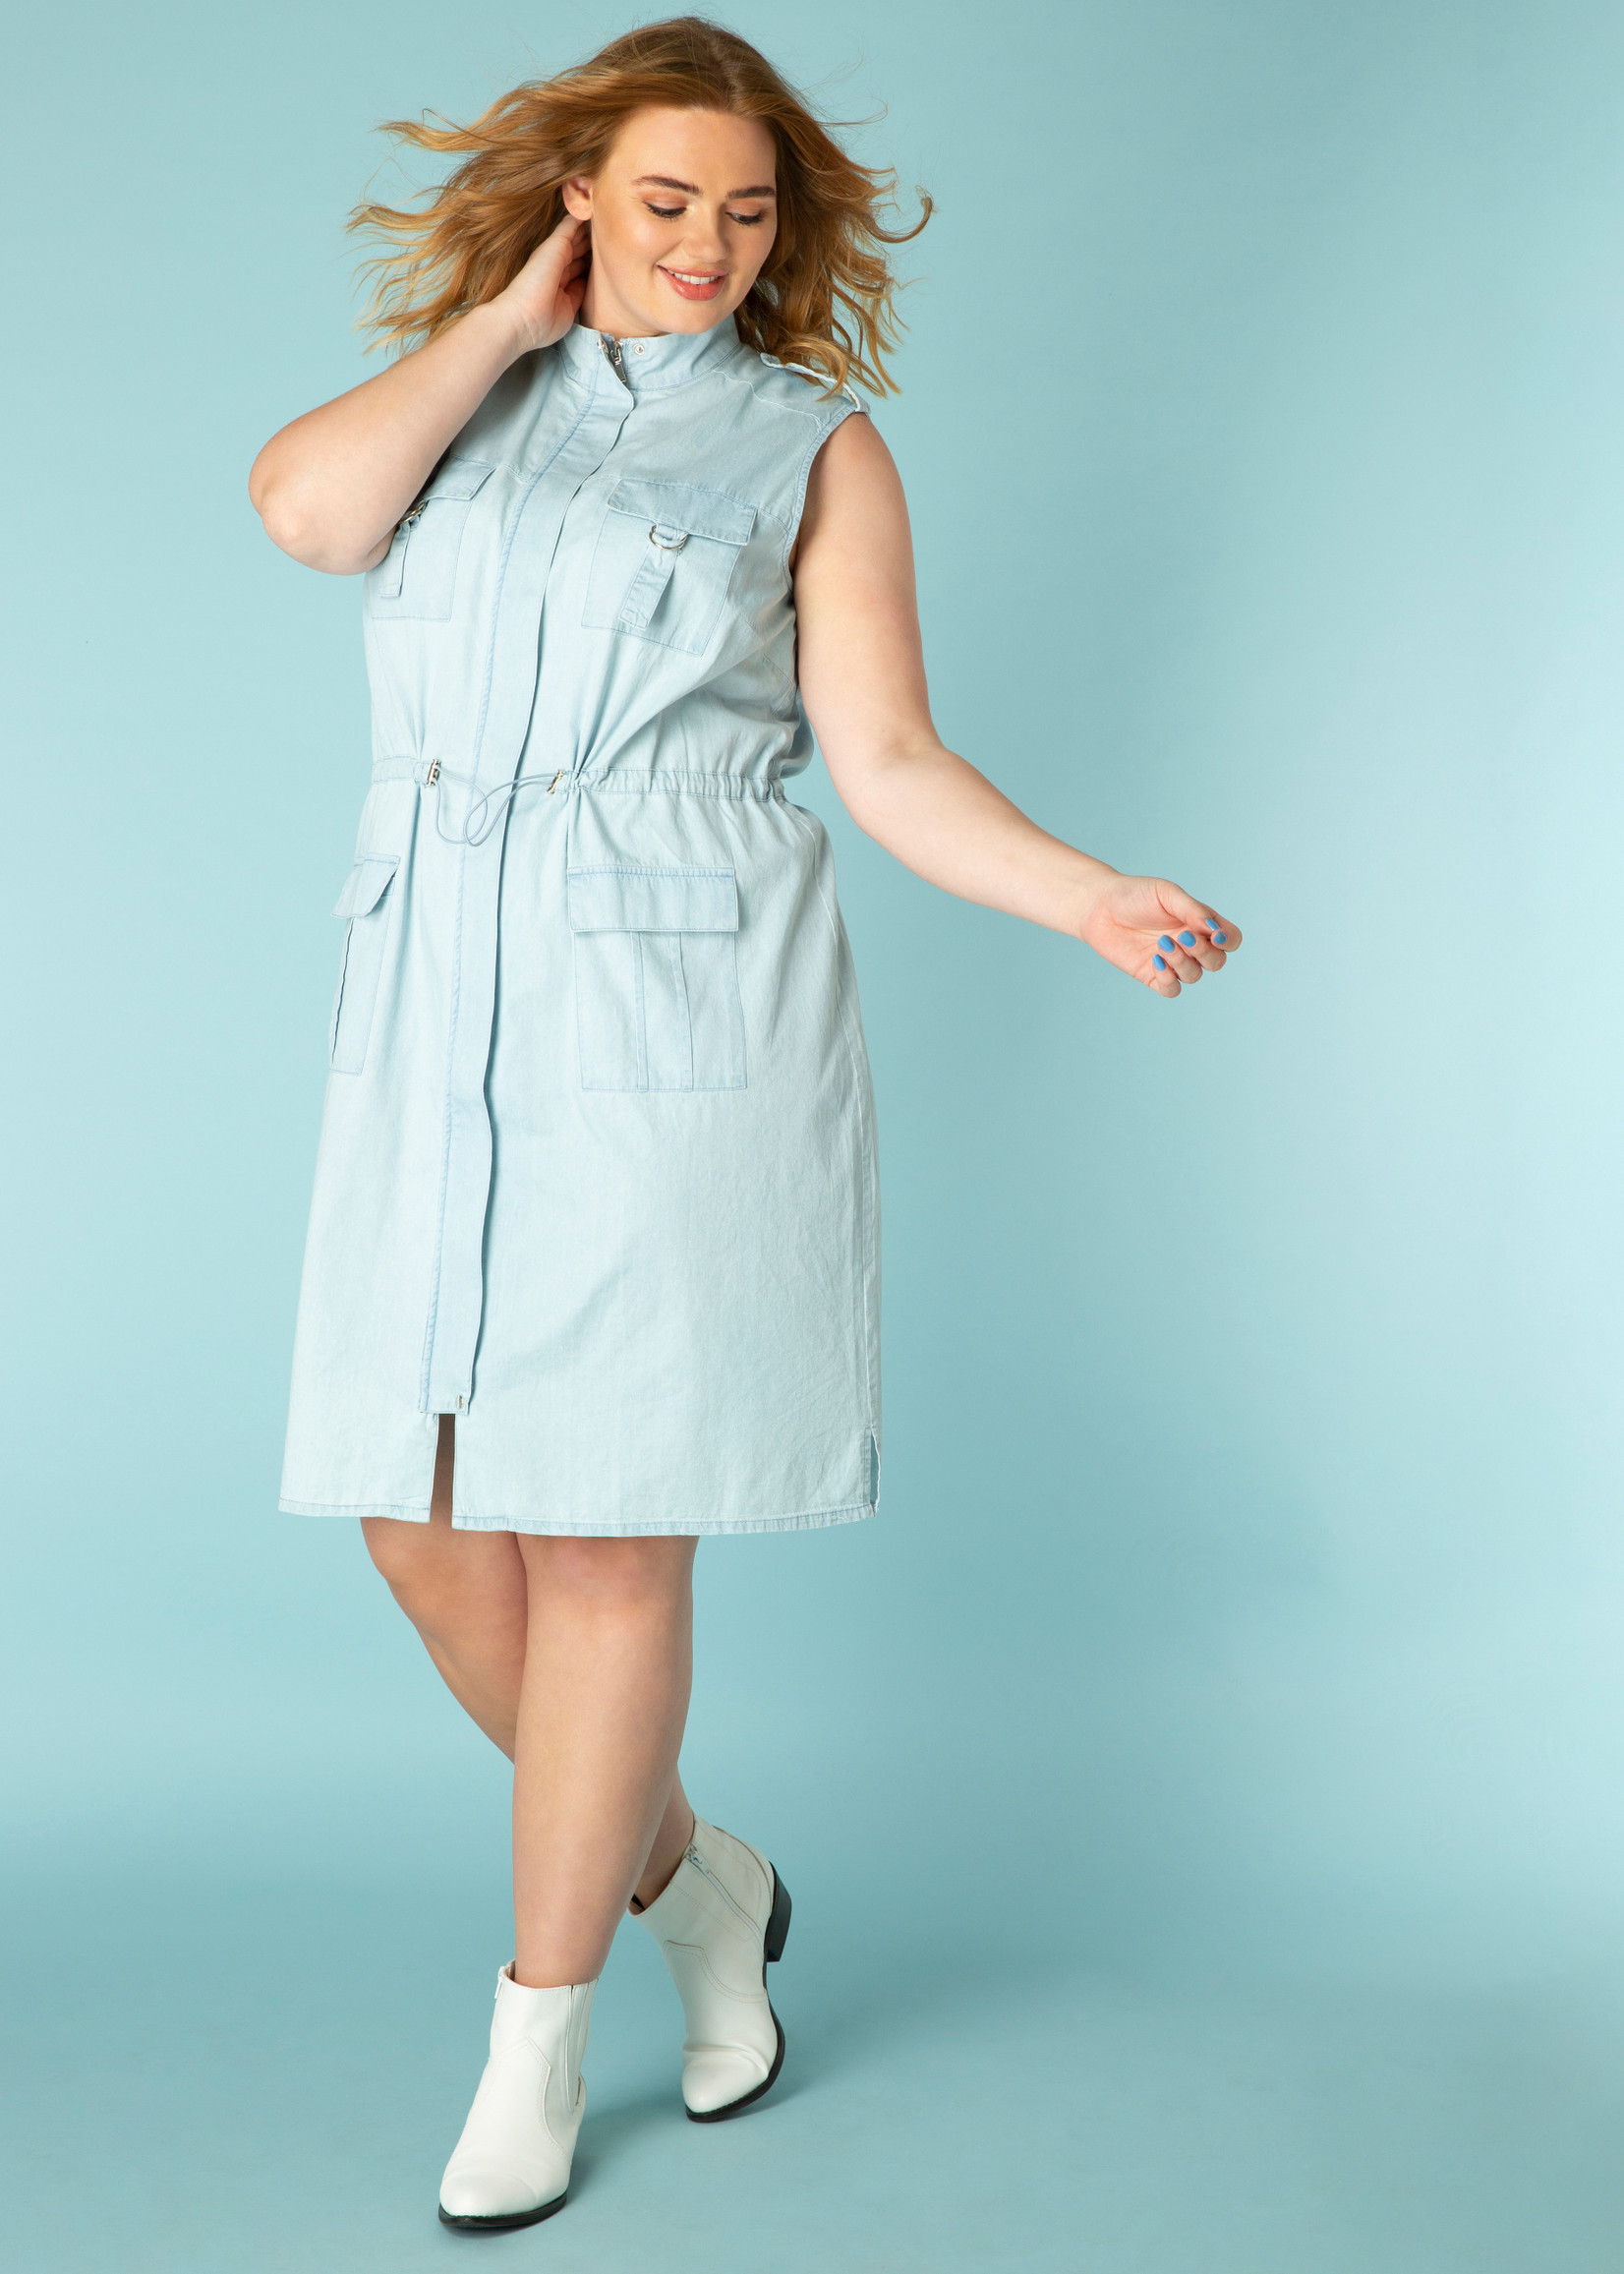 Yesta Yesta Larice Dress